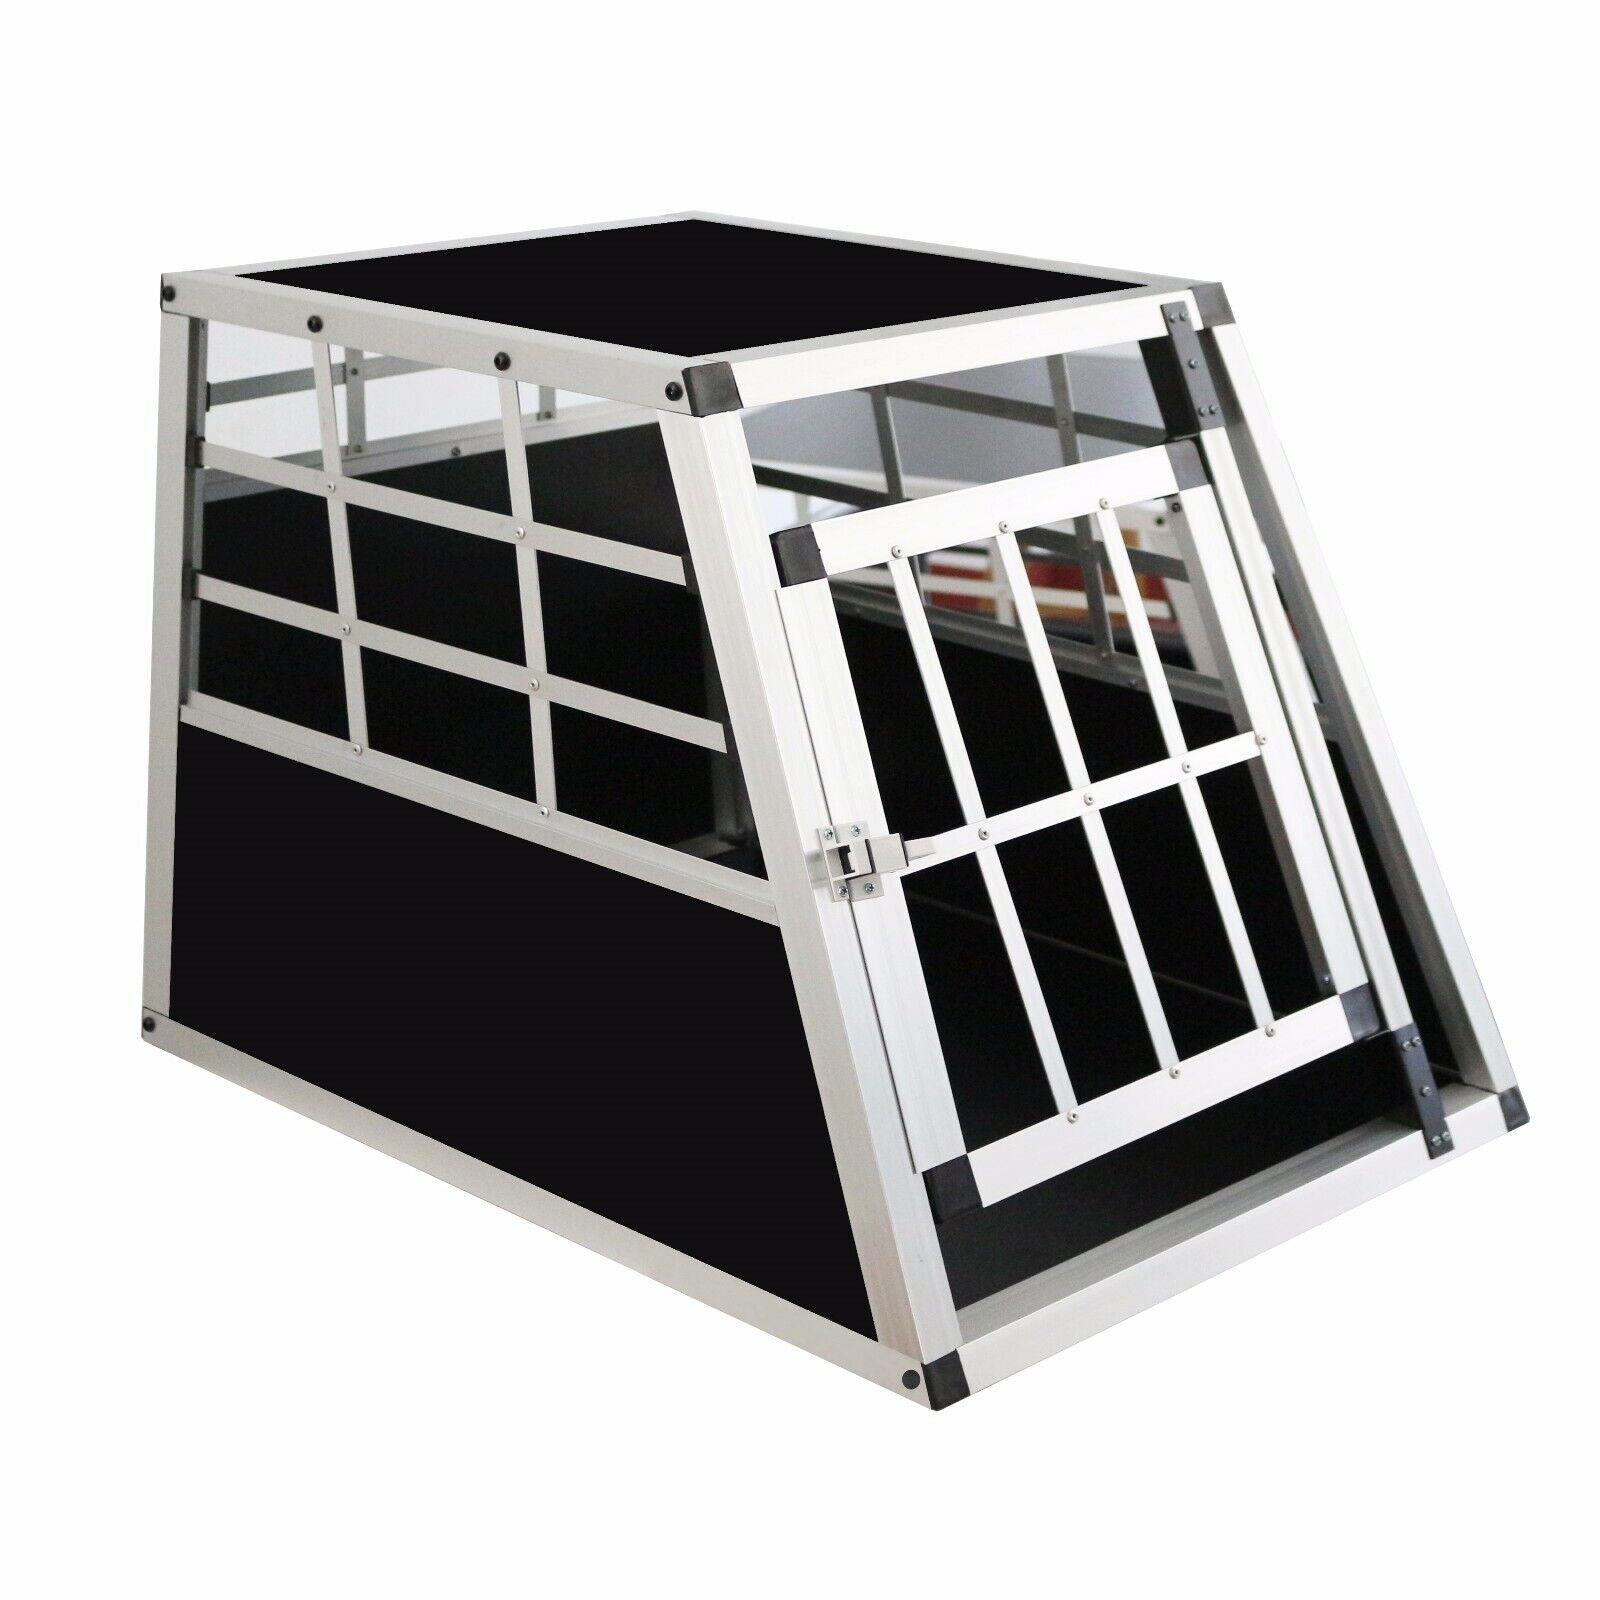 Hundetransportbox Hundebox Alu Transportbox Transportbox Transportbox Autotransportbox Reisenbox Alubox 2757c5